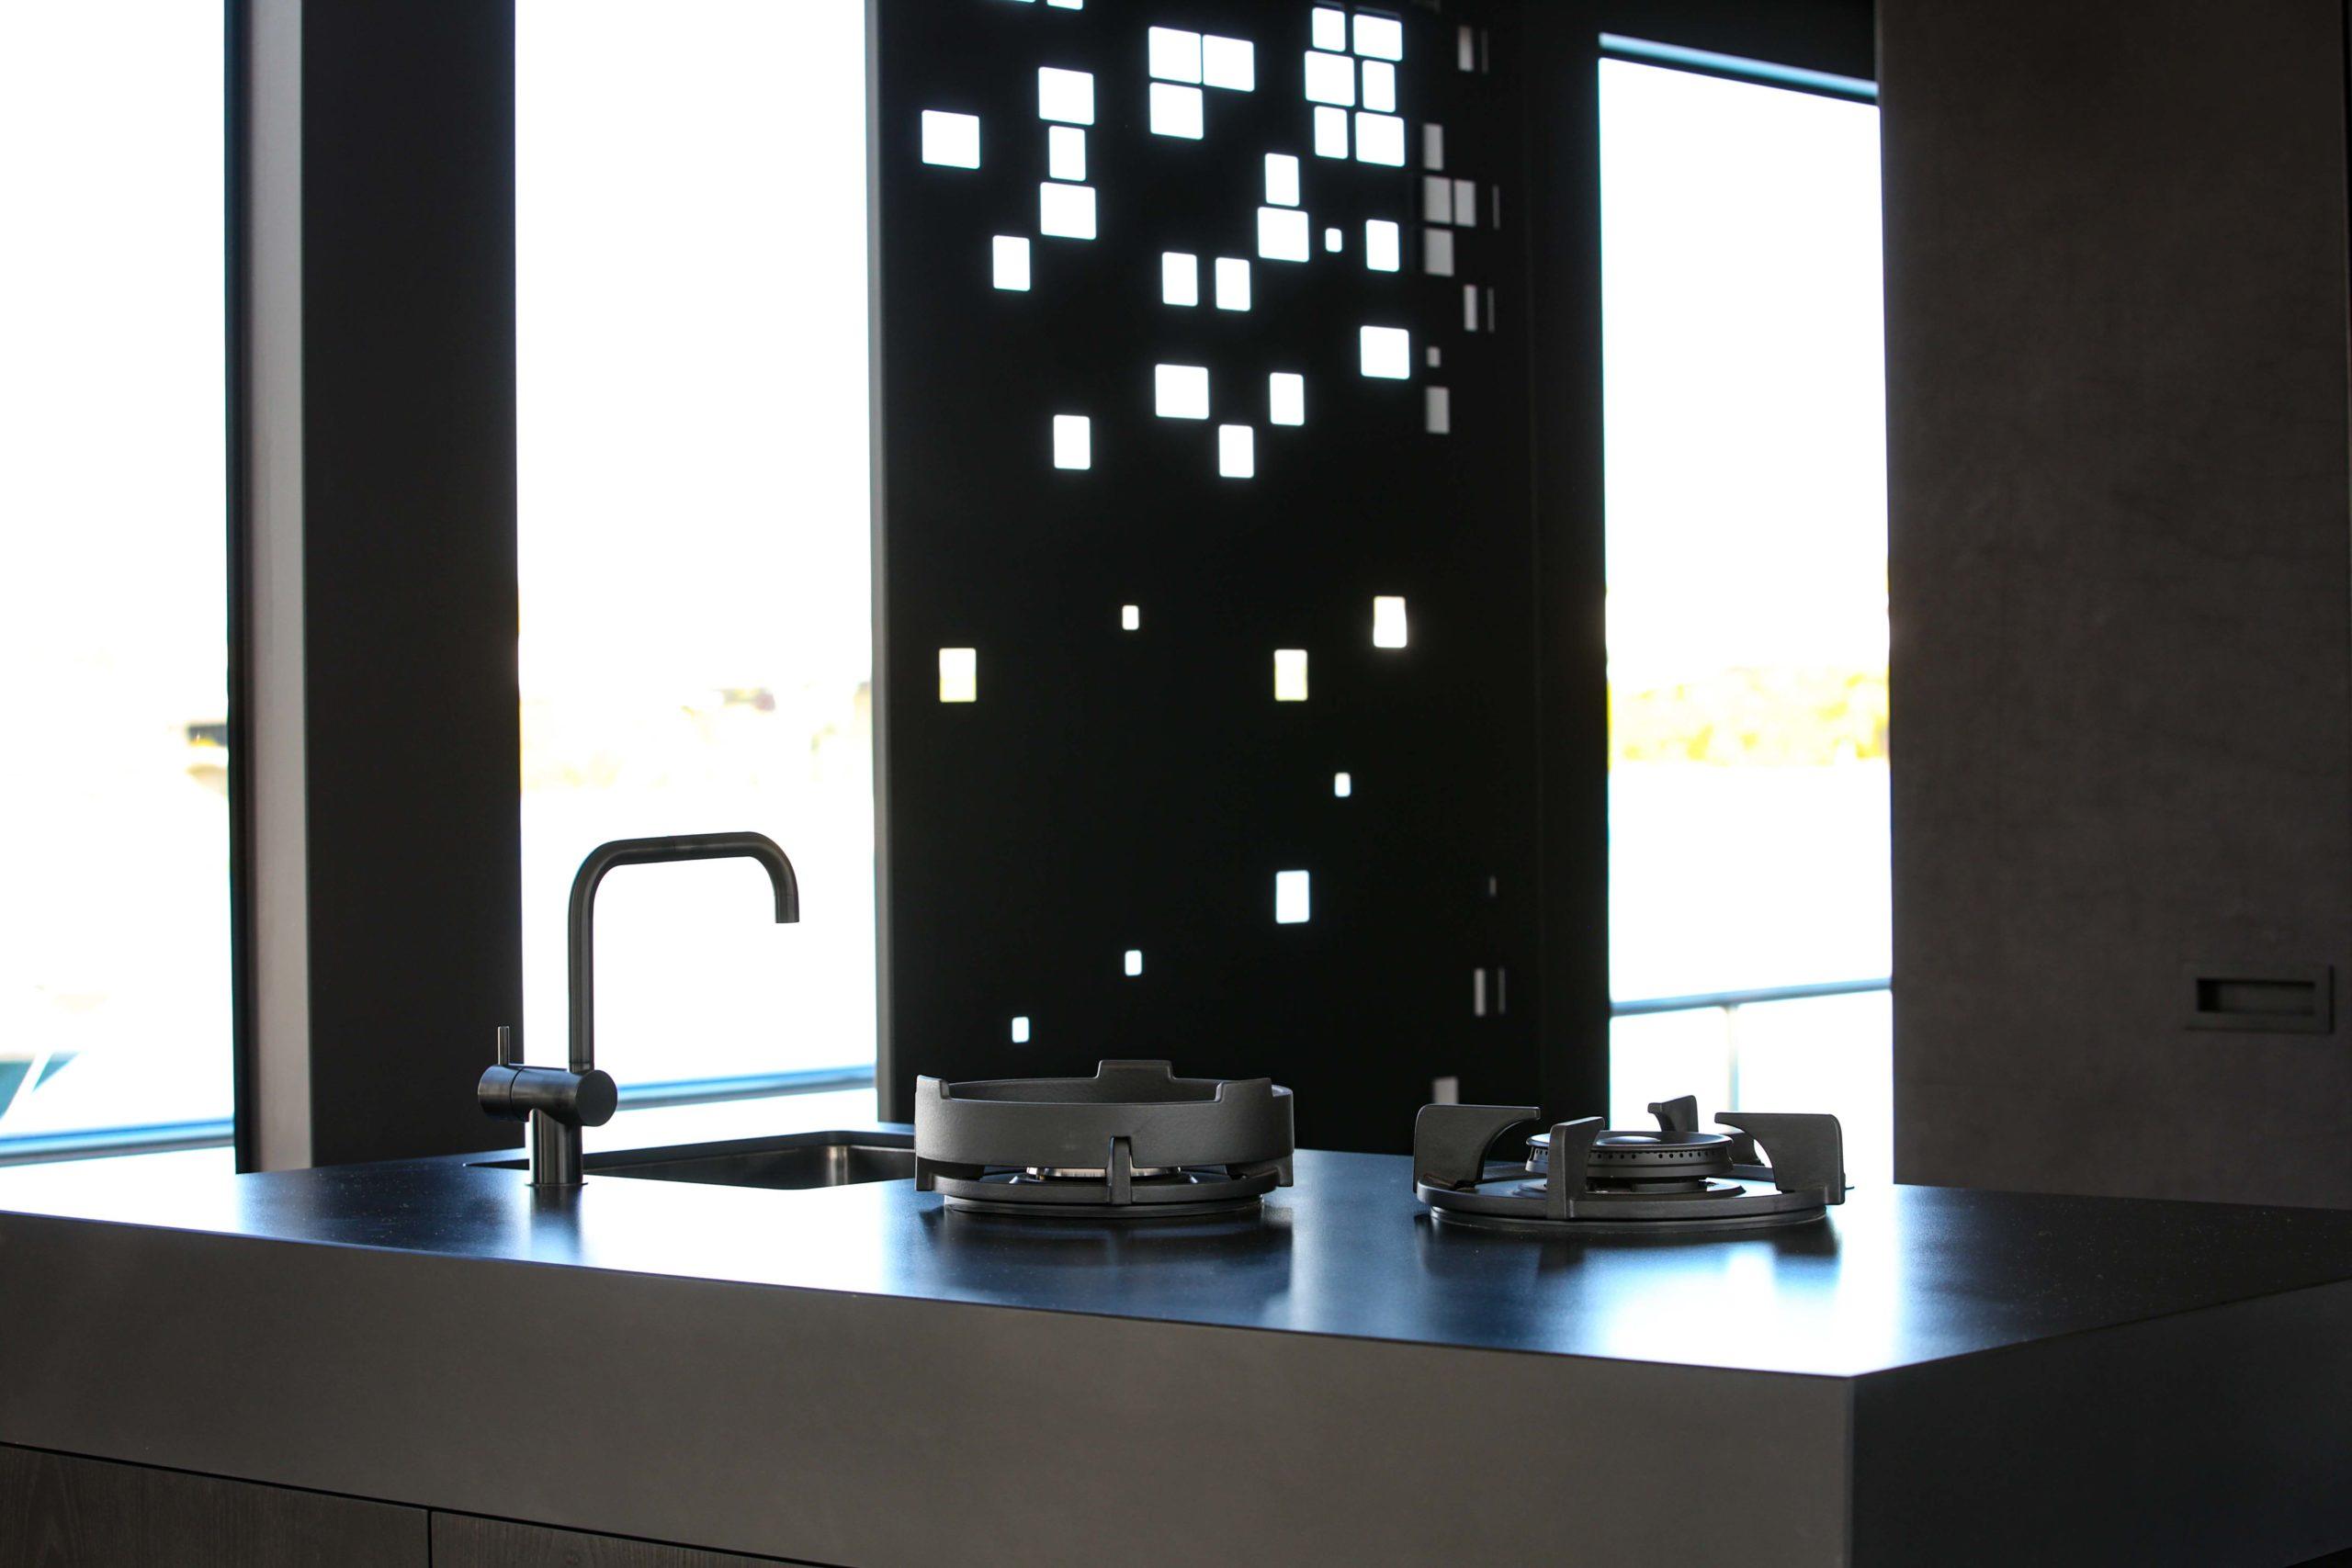 Kücheneinrichtung Kochherd Onyx Hausboot Nobla Design